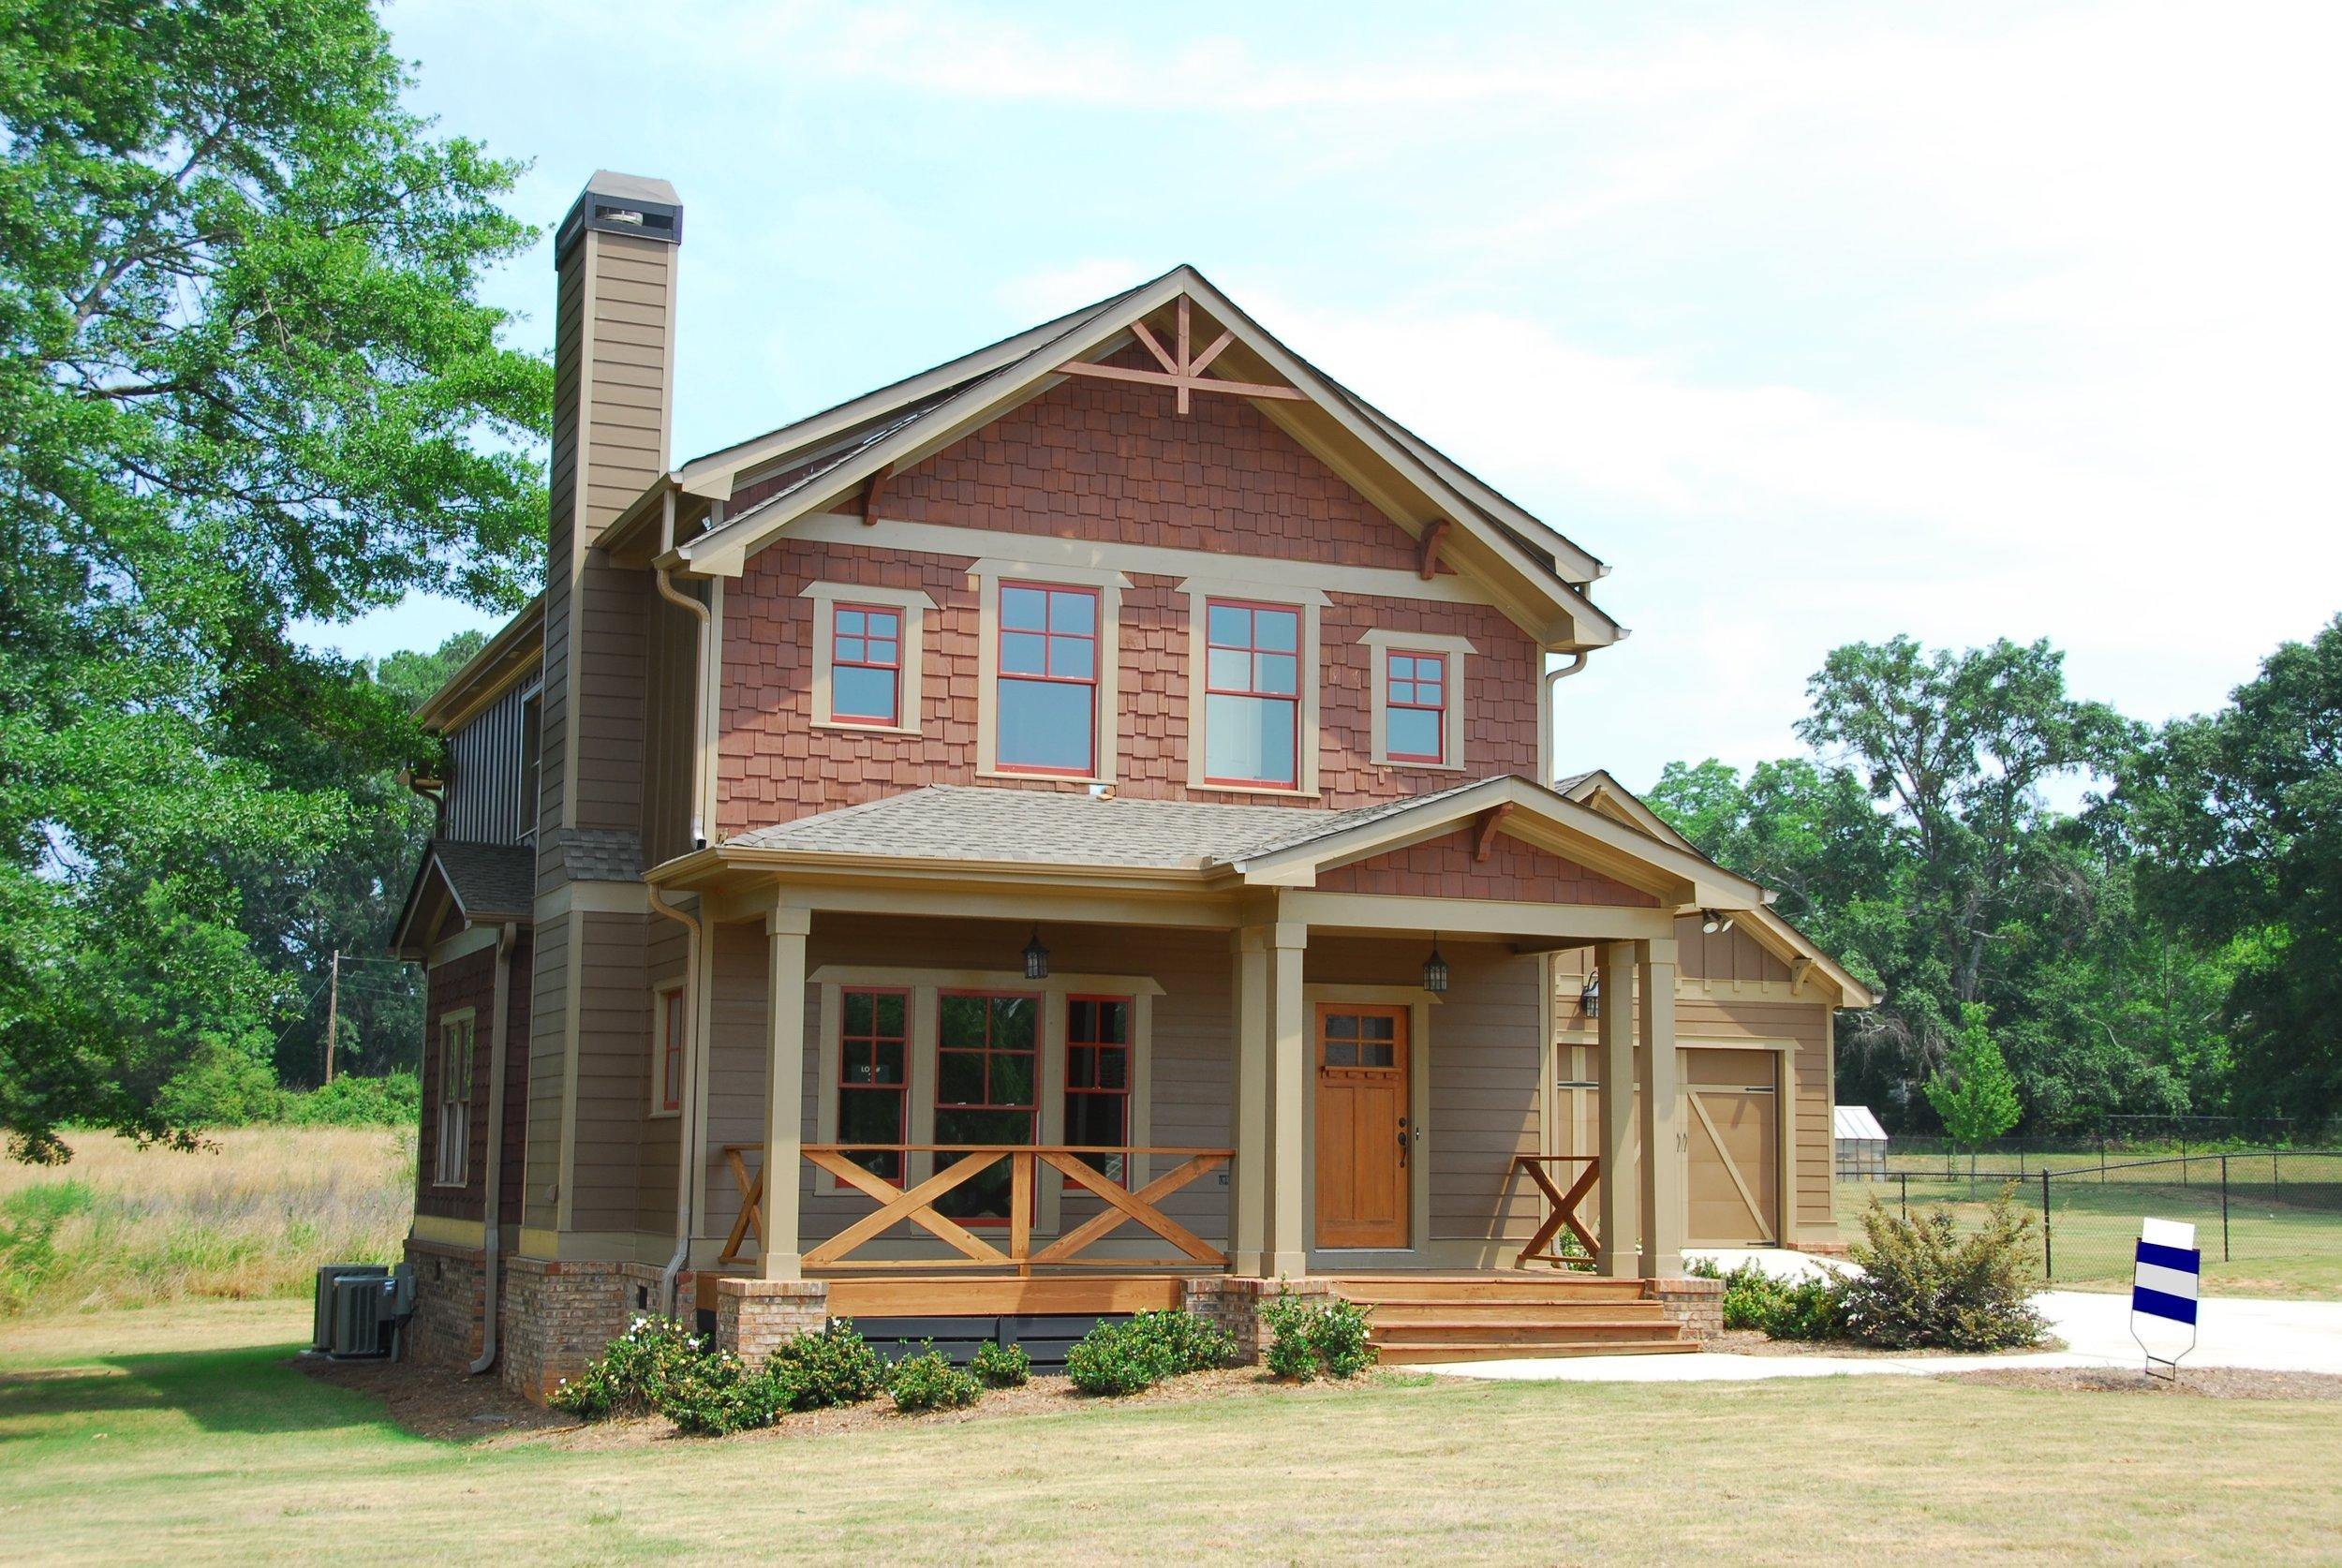 house home retro shingles porch patio.jpeg